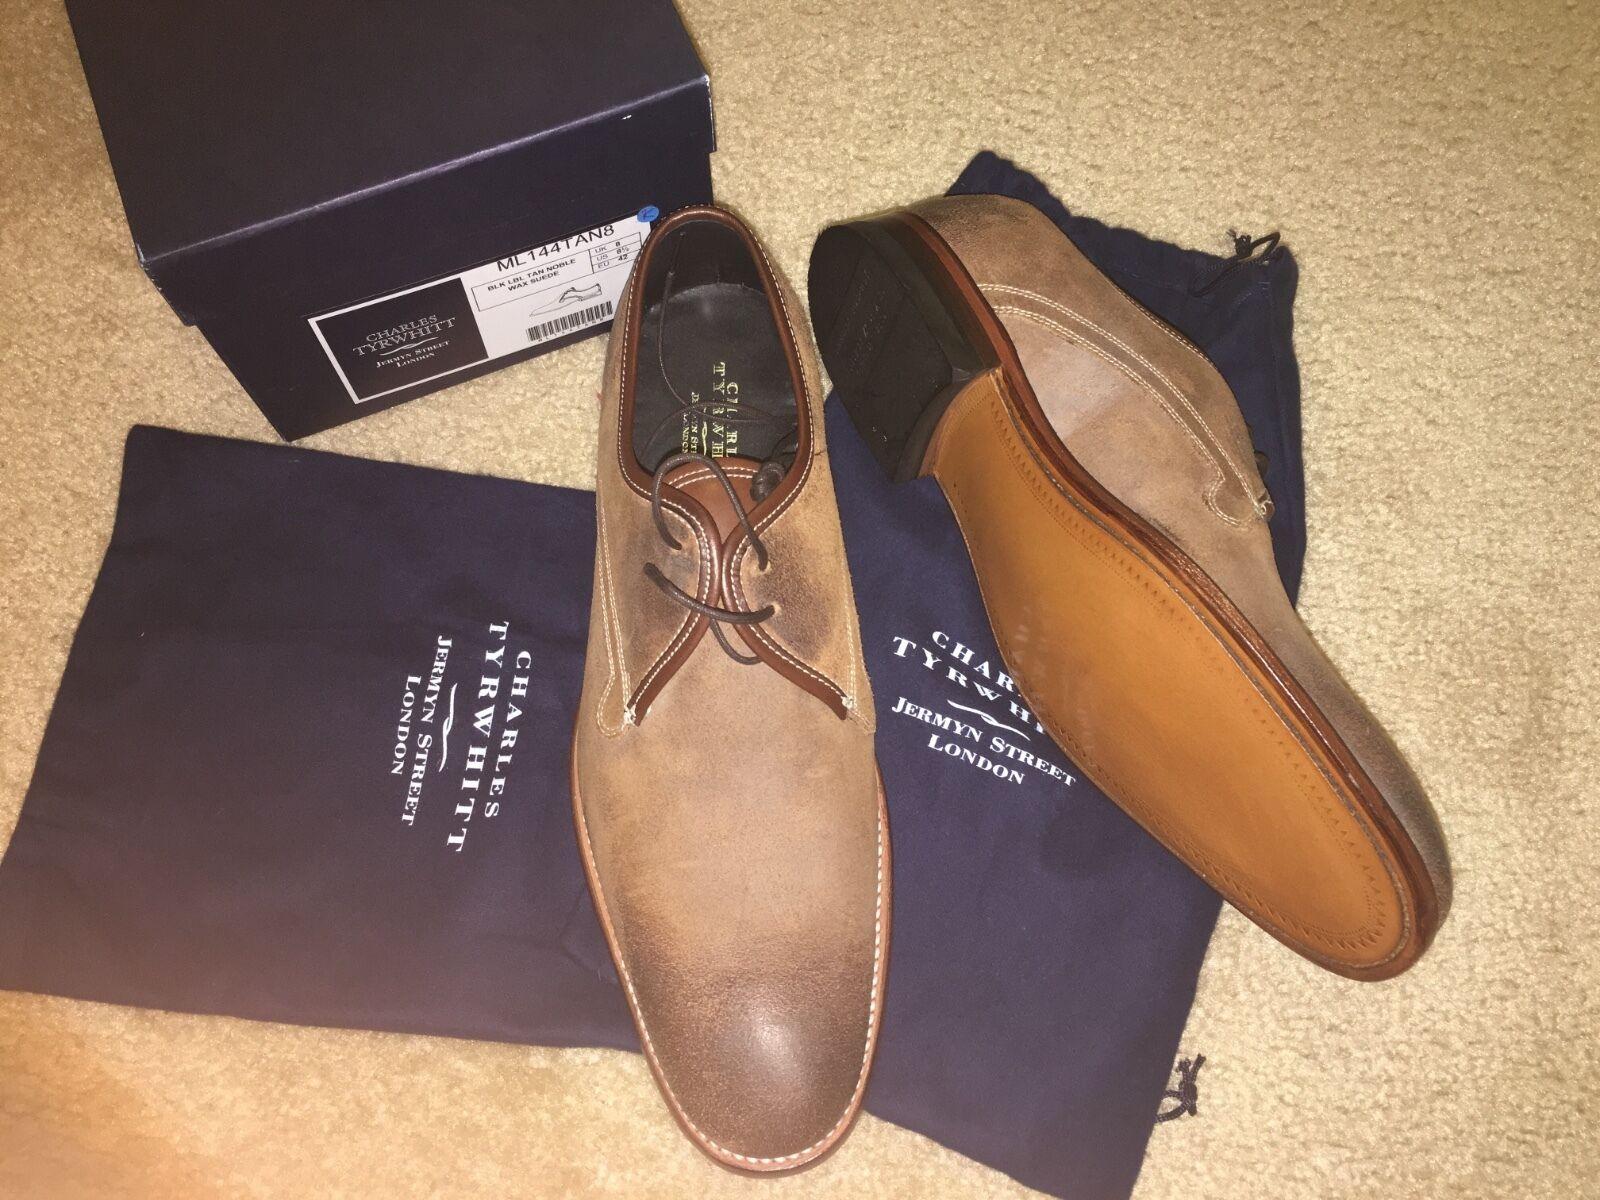 Nuevo Charles Tyrwhitt Goodyear Welted Inglaterra negro Label tan Noble Cera Zapatos 8.5